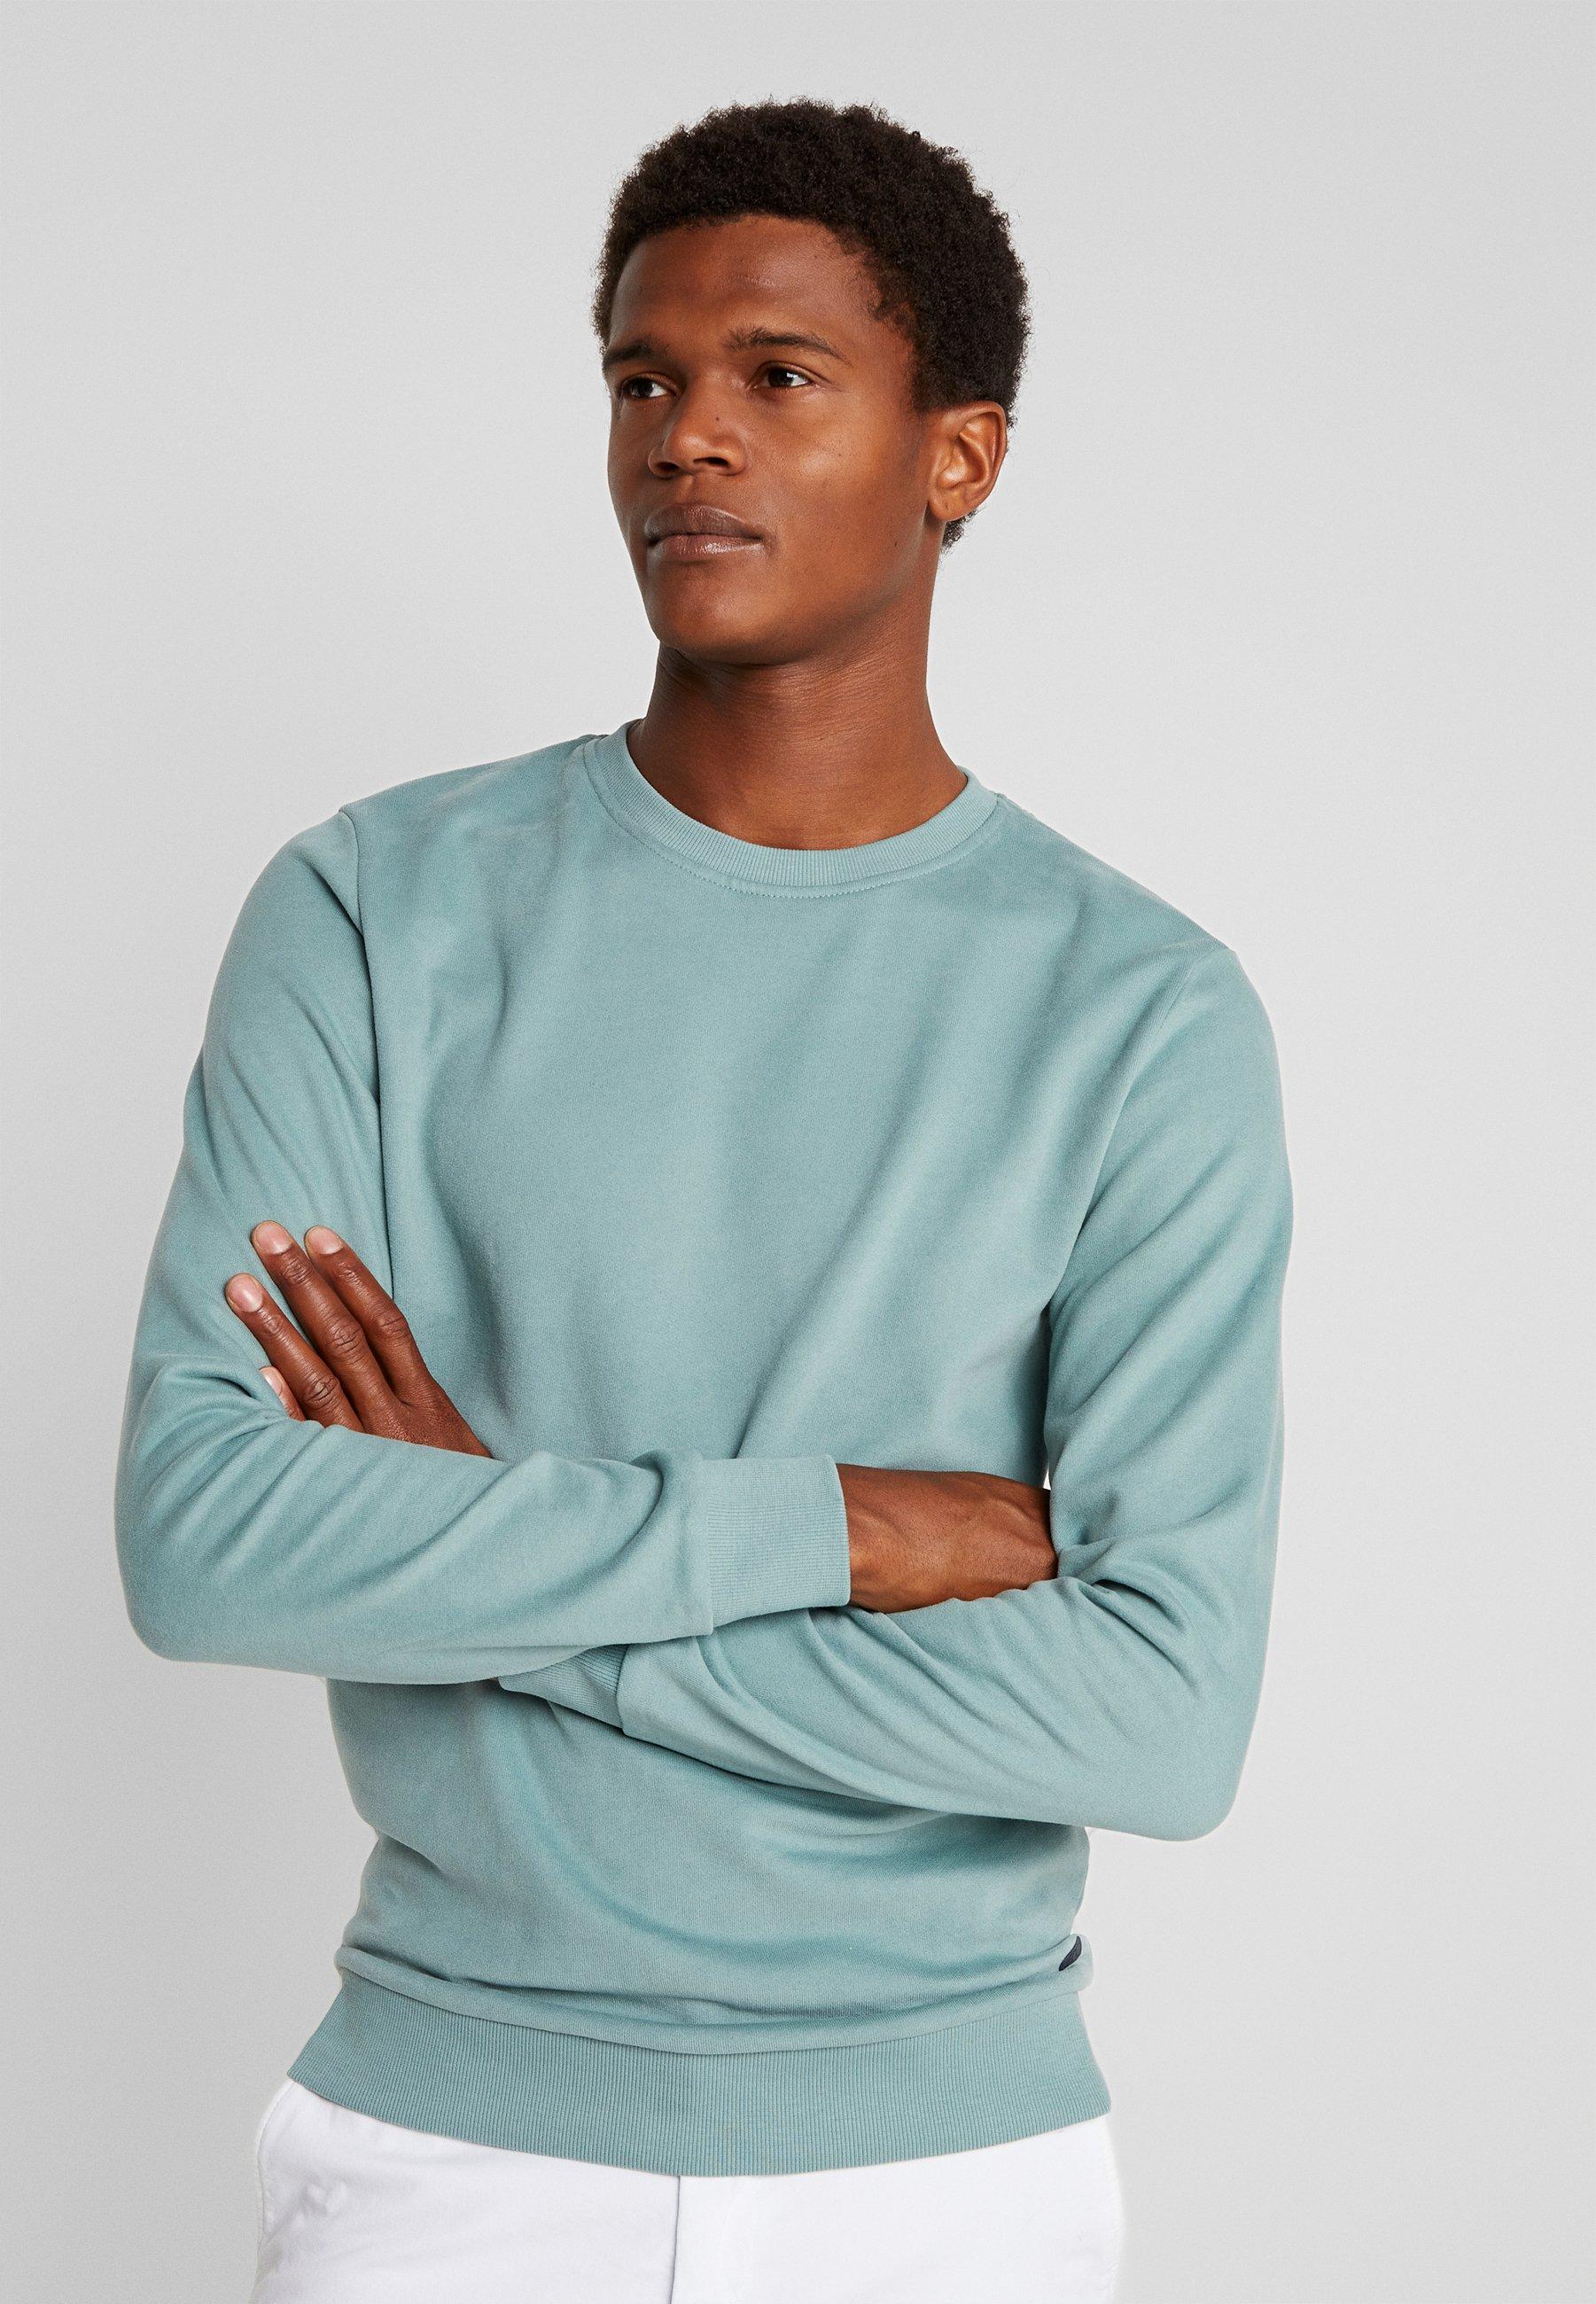 By Aqua Green BasicSweatshirt Light Edc Best Esprit dQBrCxEoWe